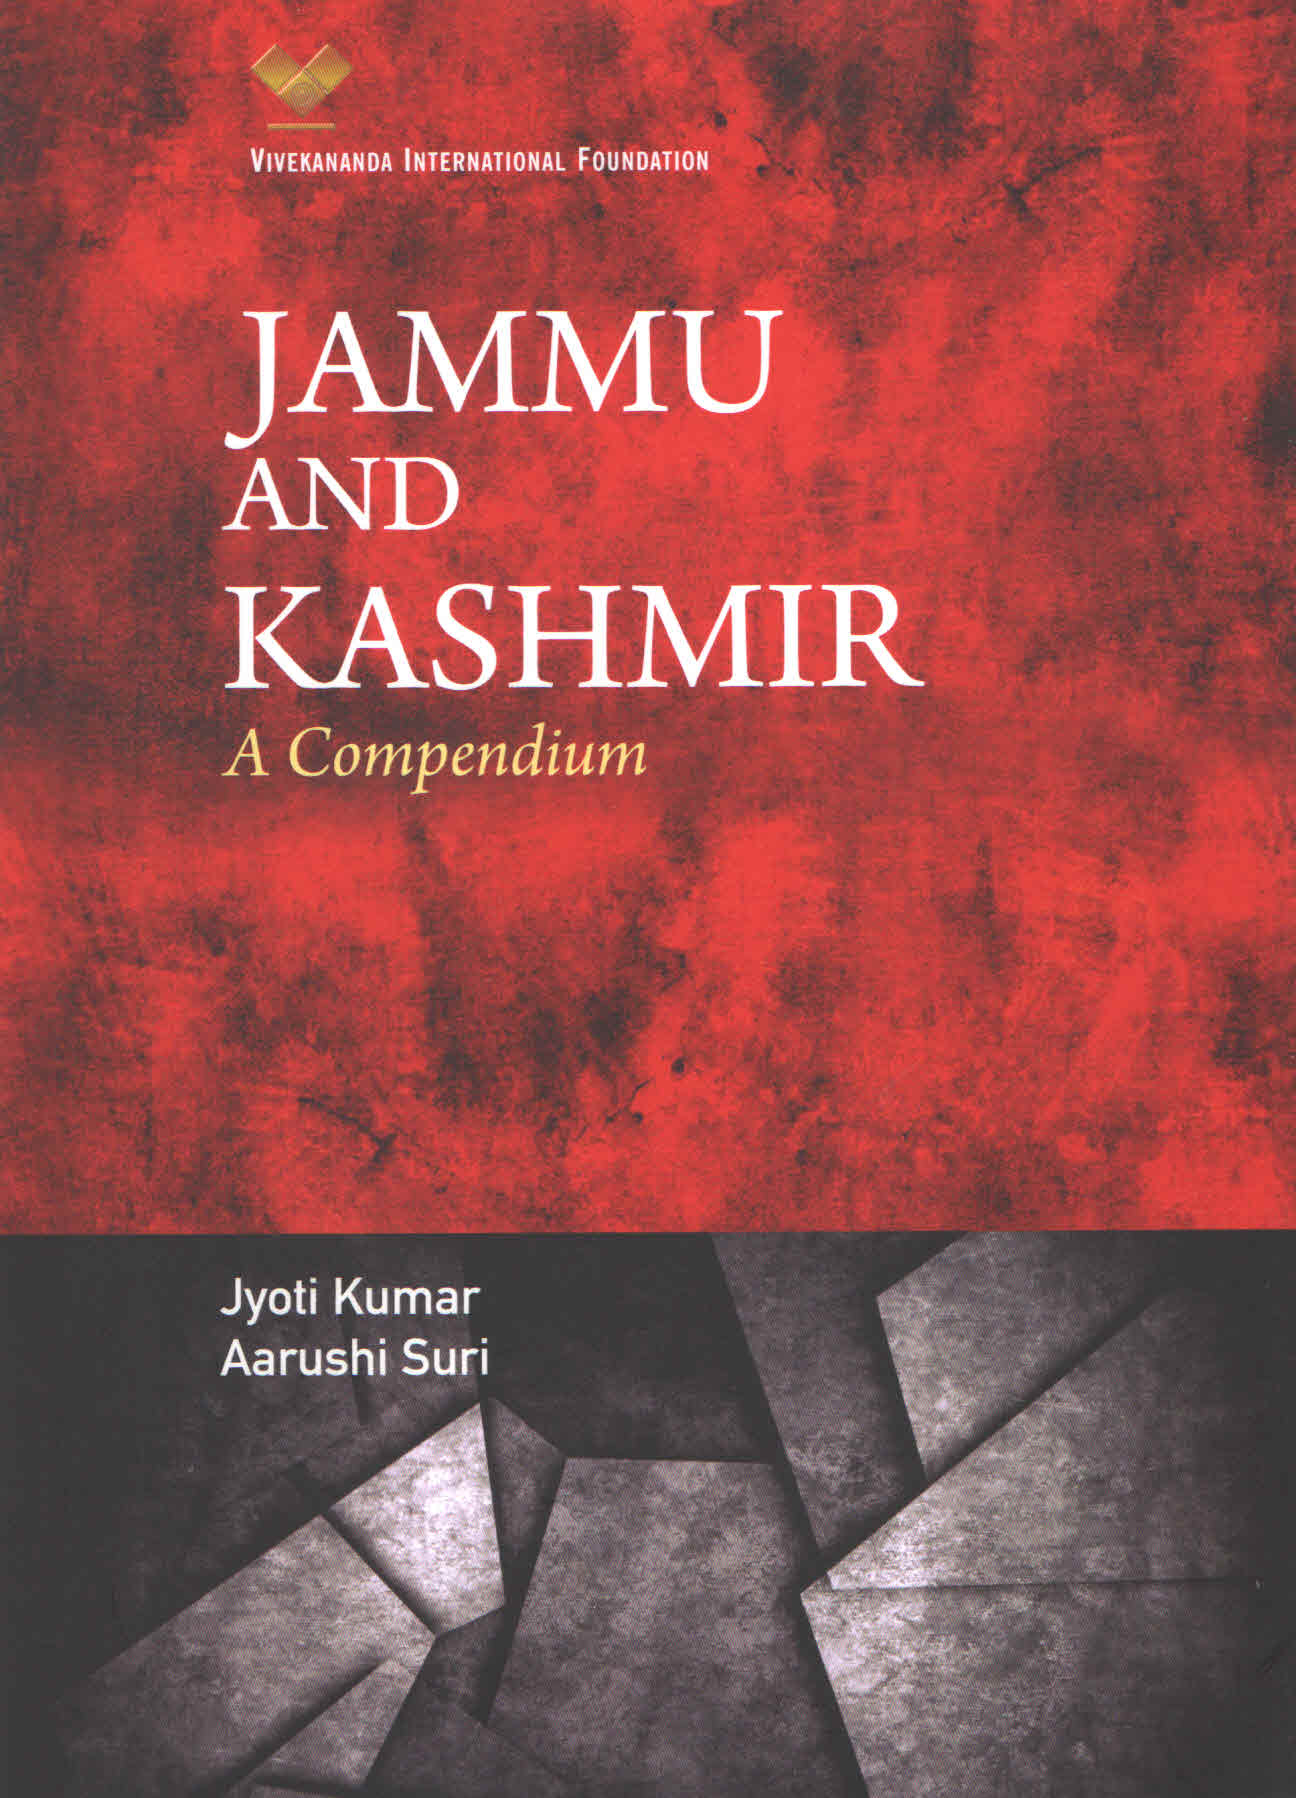 Jammu and Kashmir: A Compendium (Vivekananda Inter…